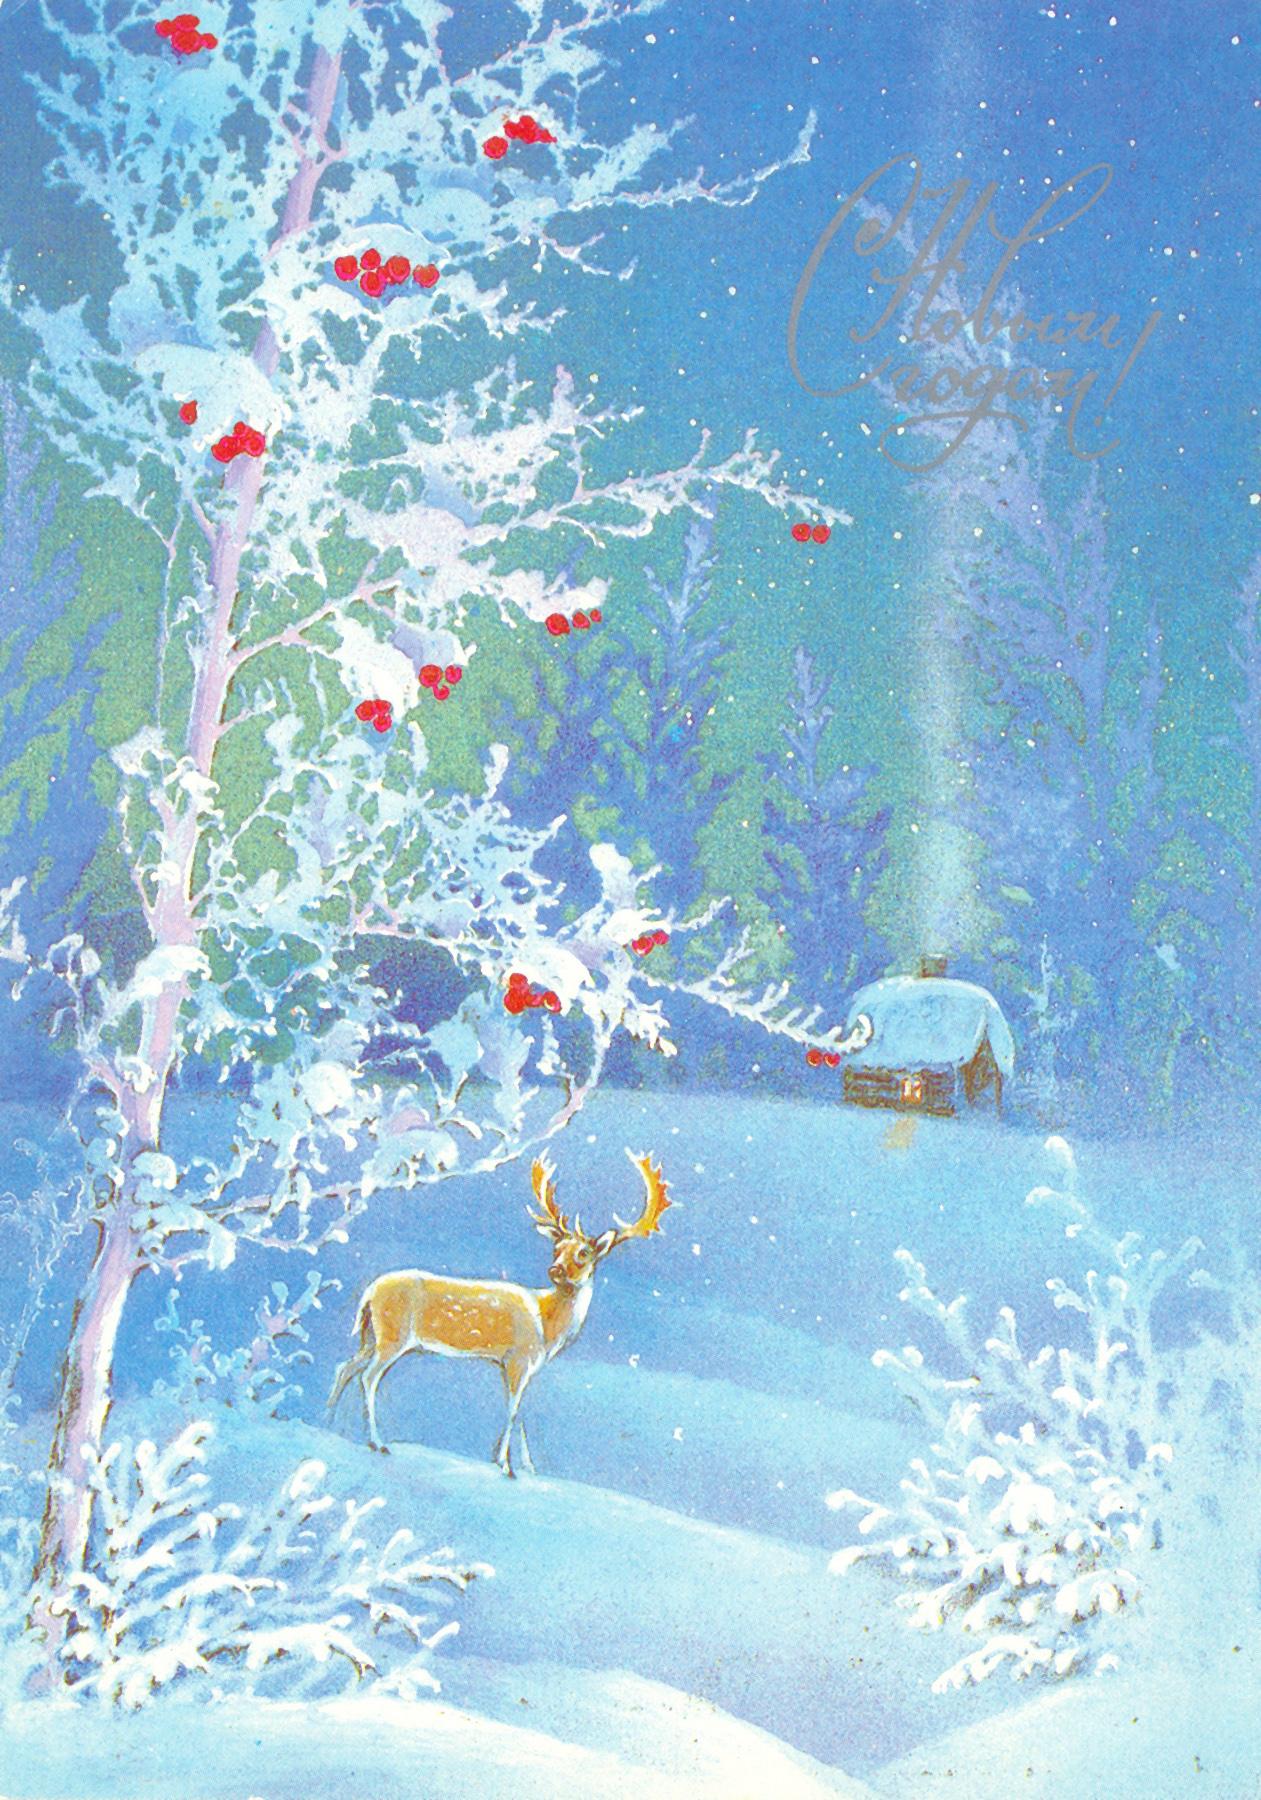 Зимние открытки фото